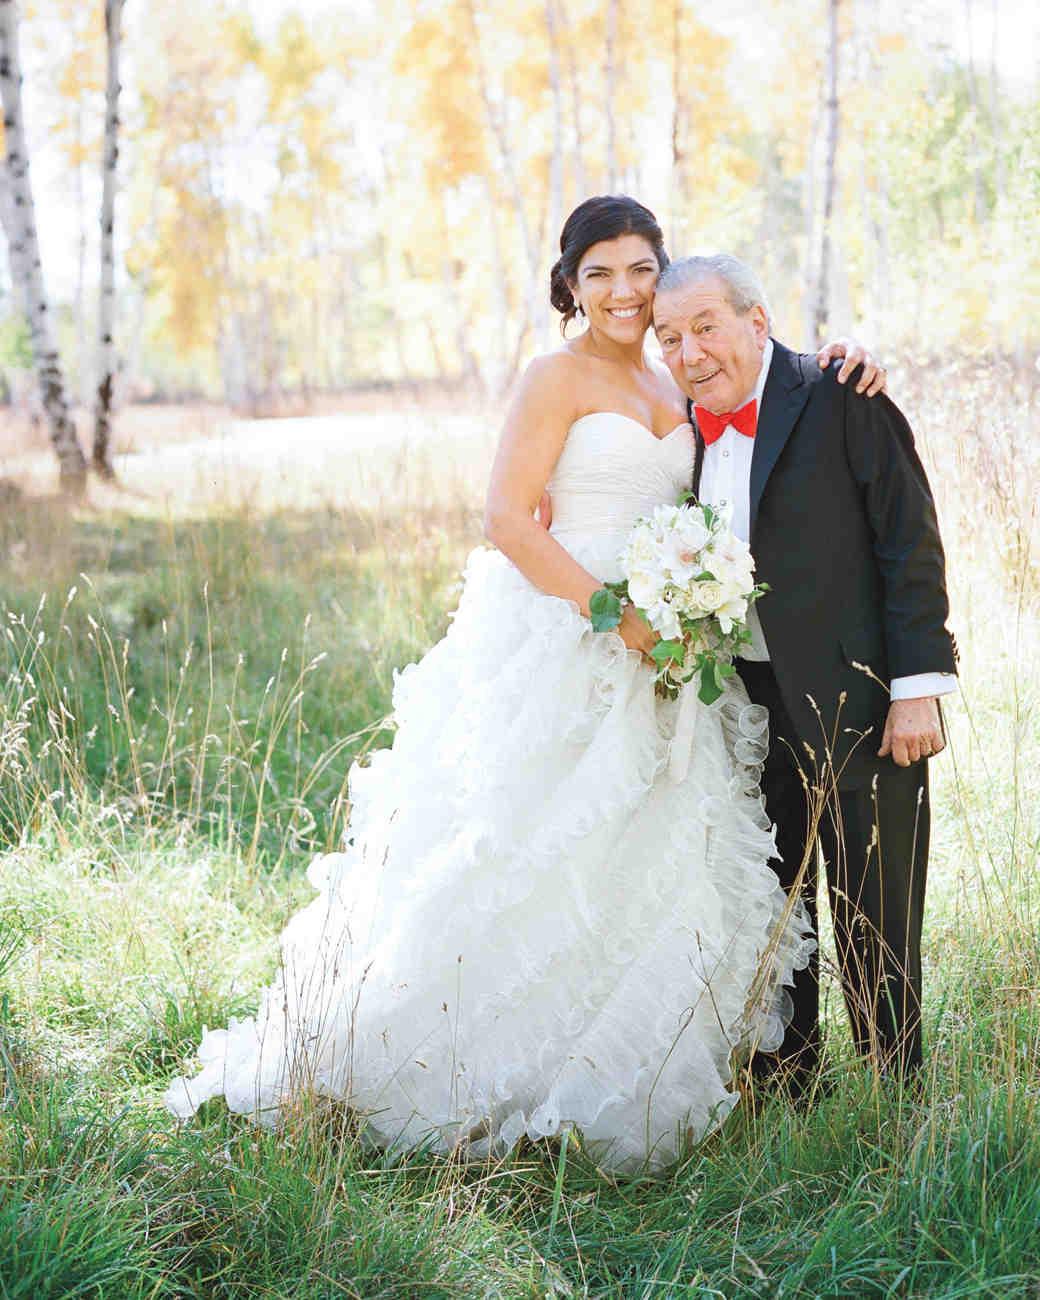 ali-andrew-wedding-wyoming-066-s111942.jpg